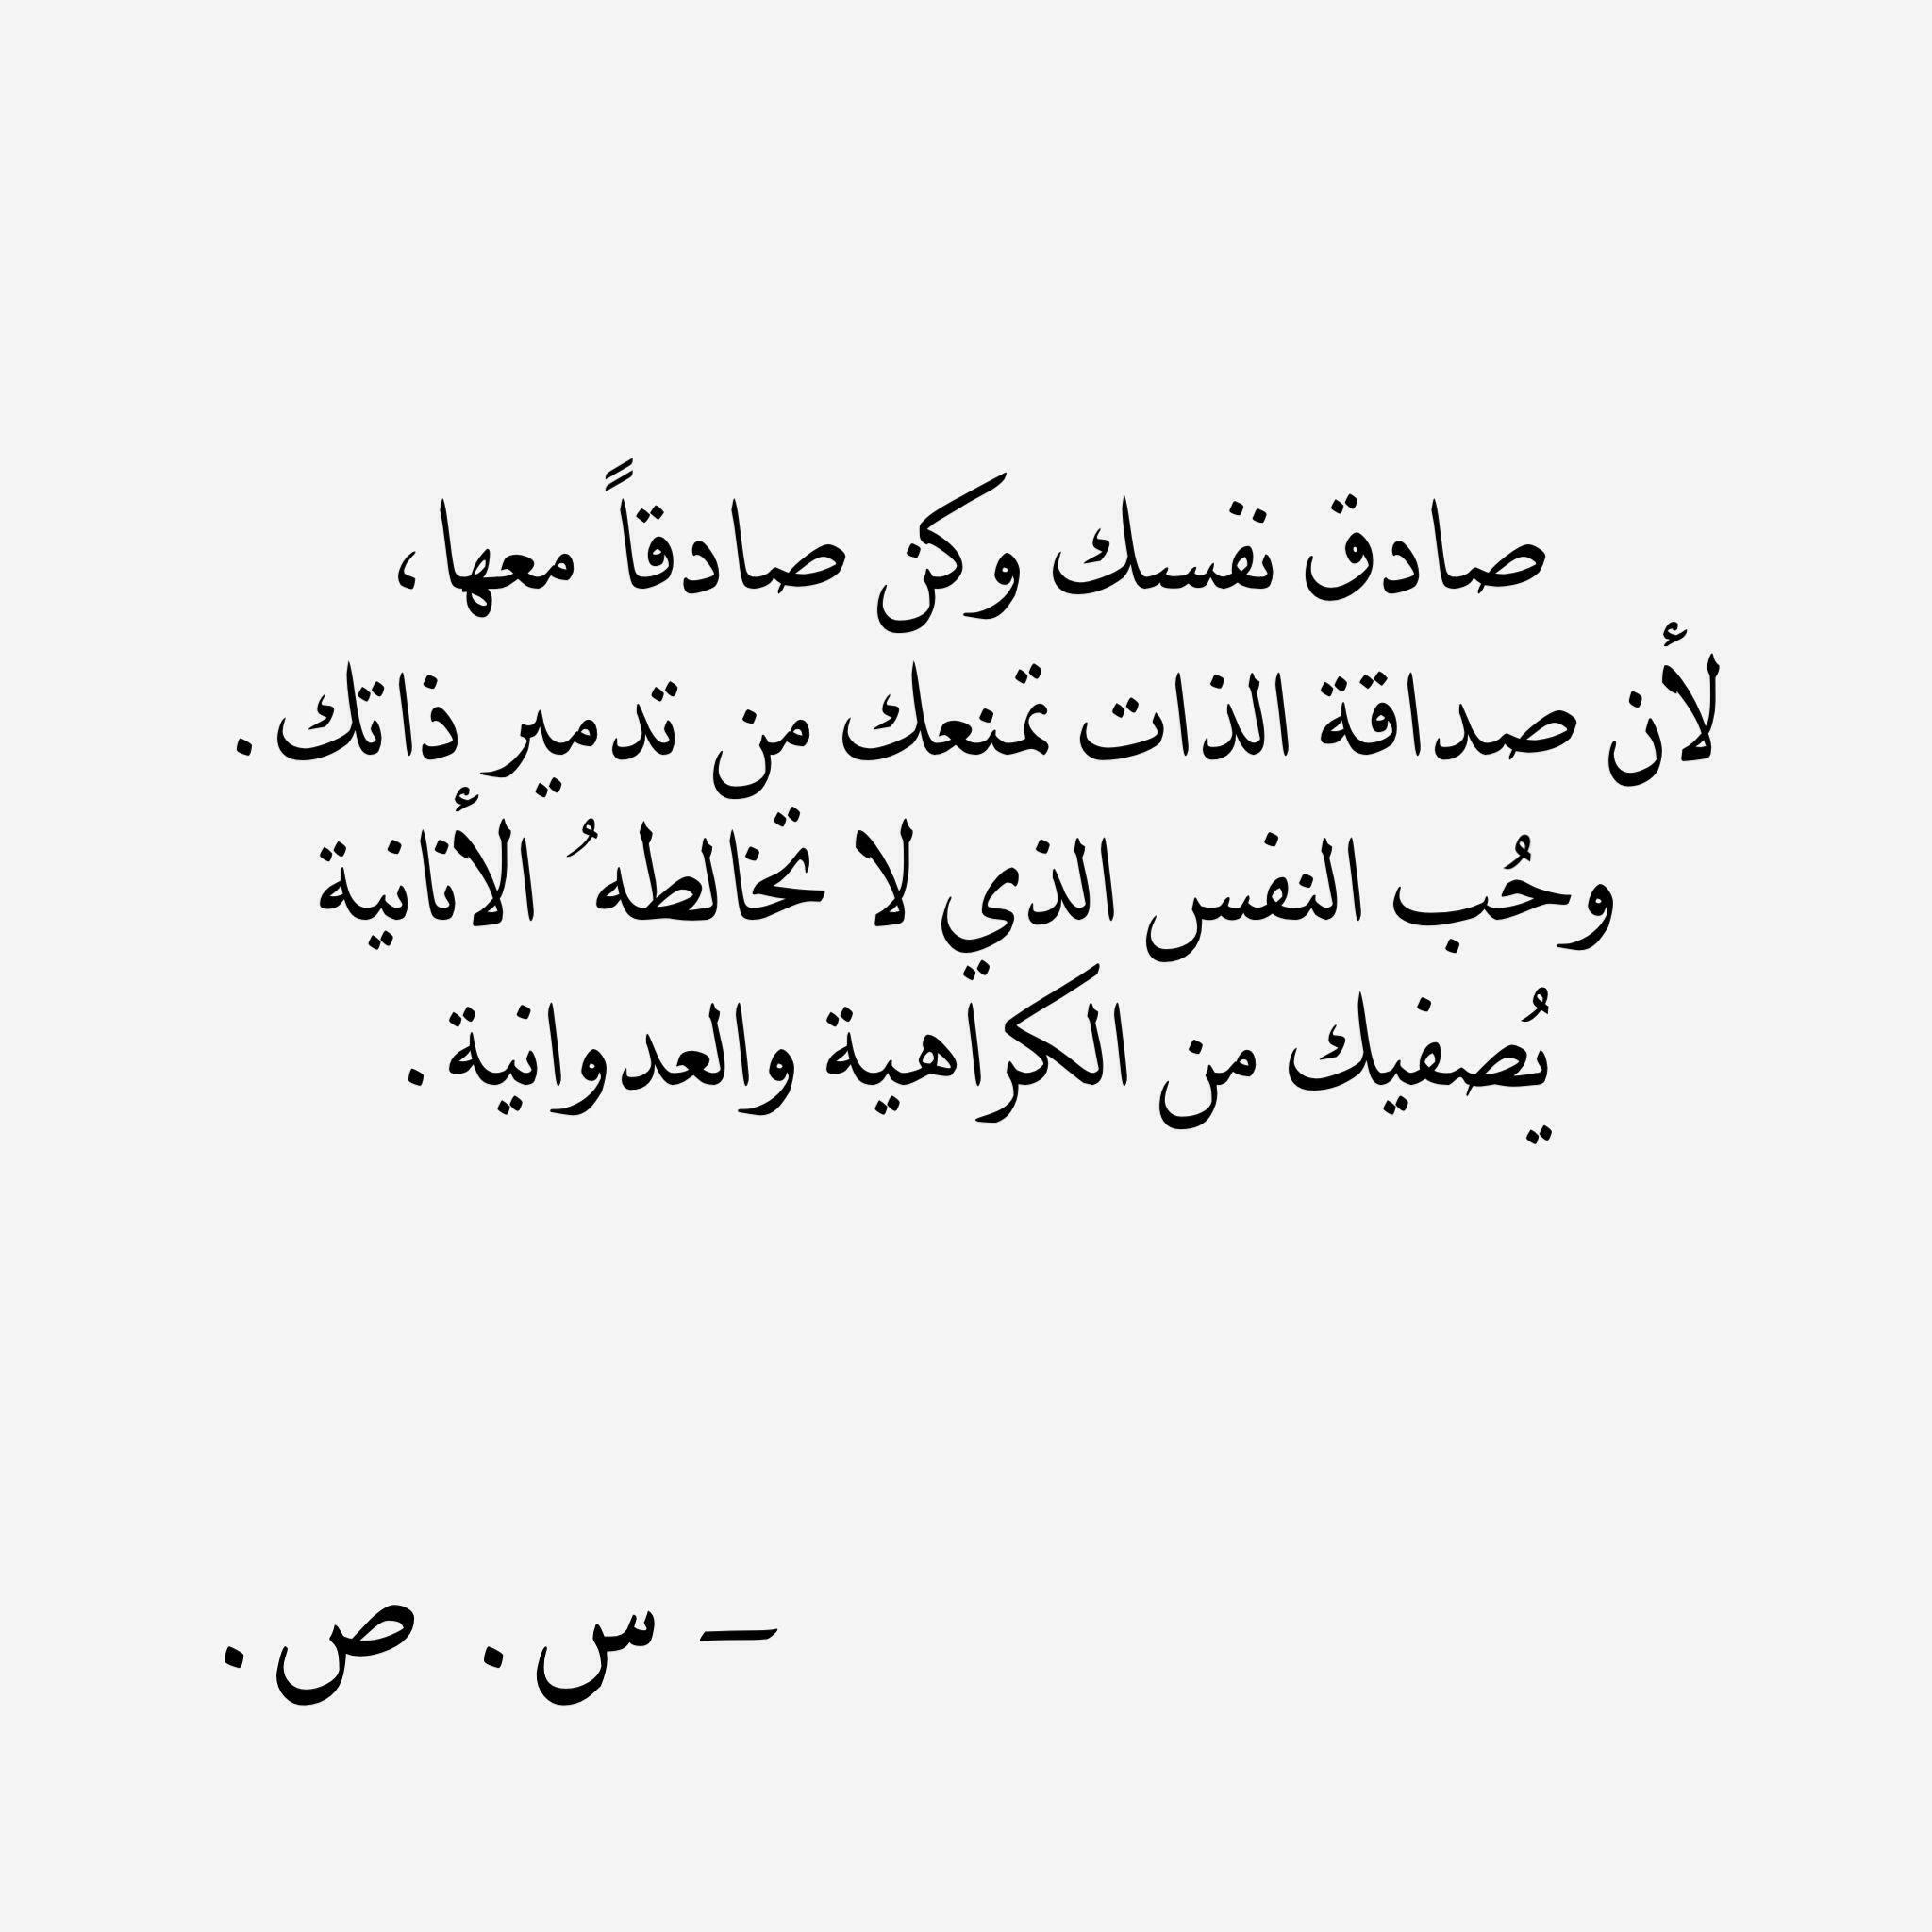 صادق نفسك Wise Words Quotes New Beginning Quotes Funny Arabic Quotes